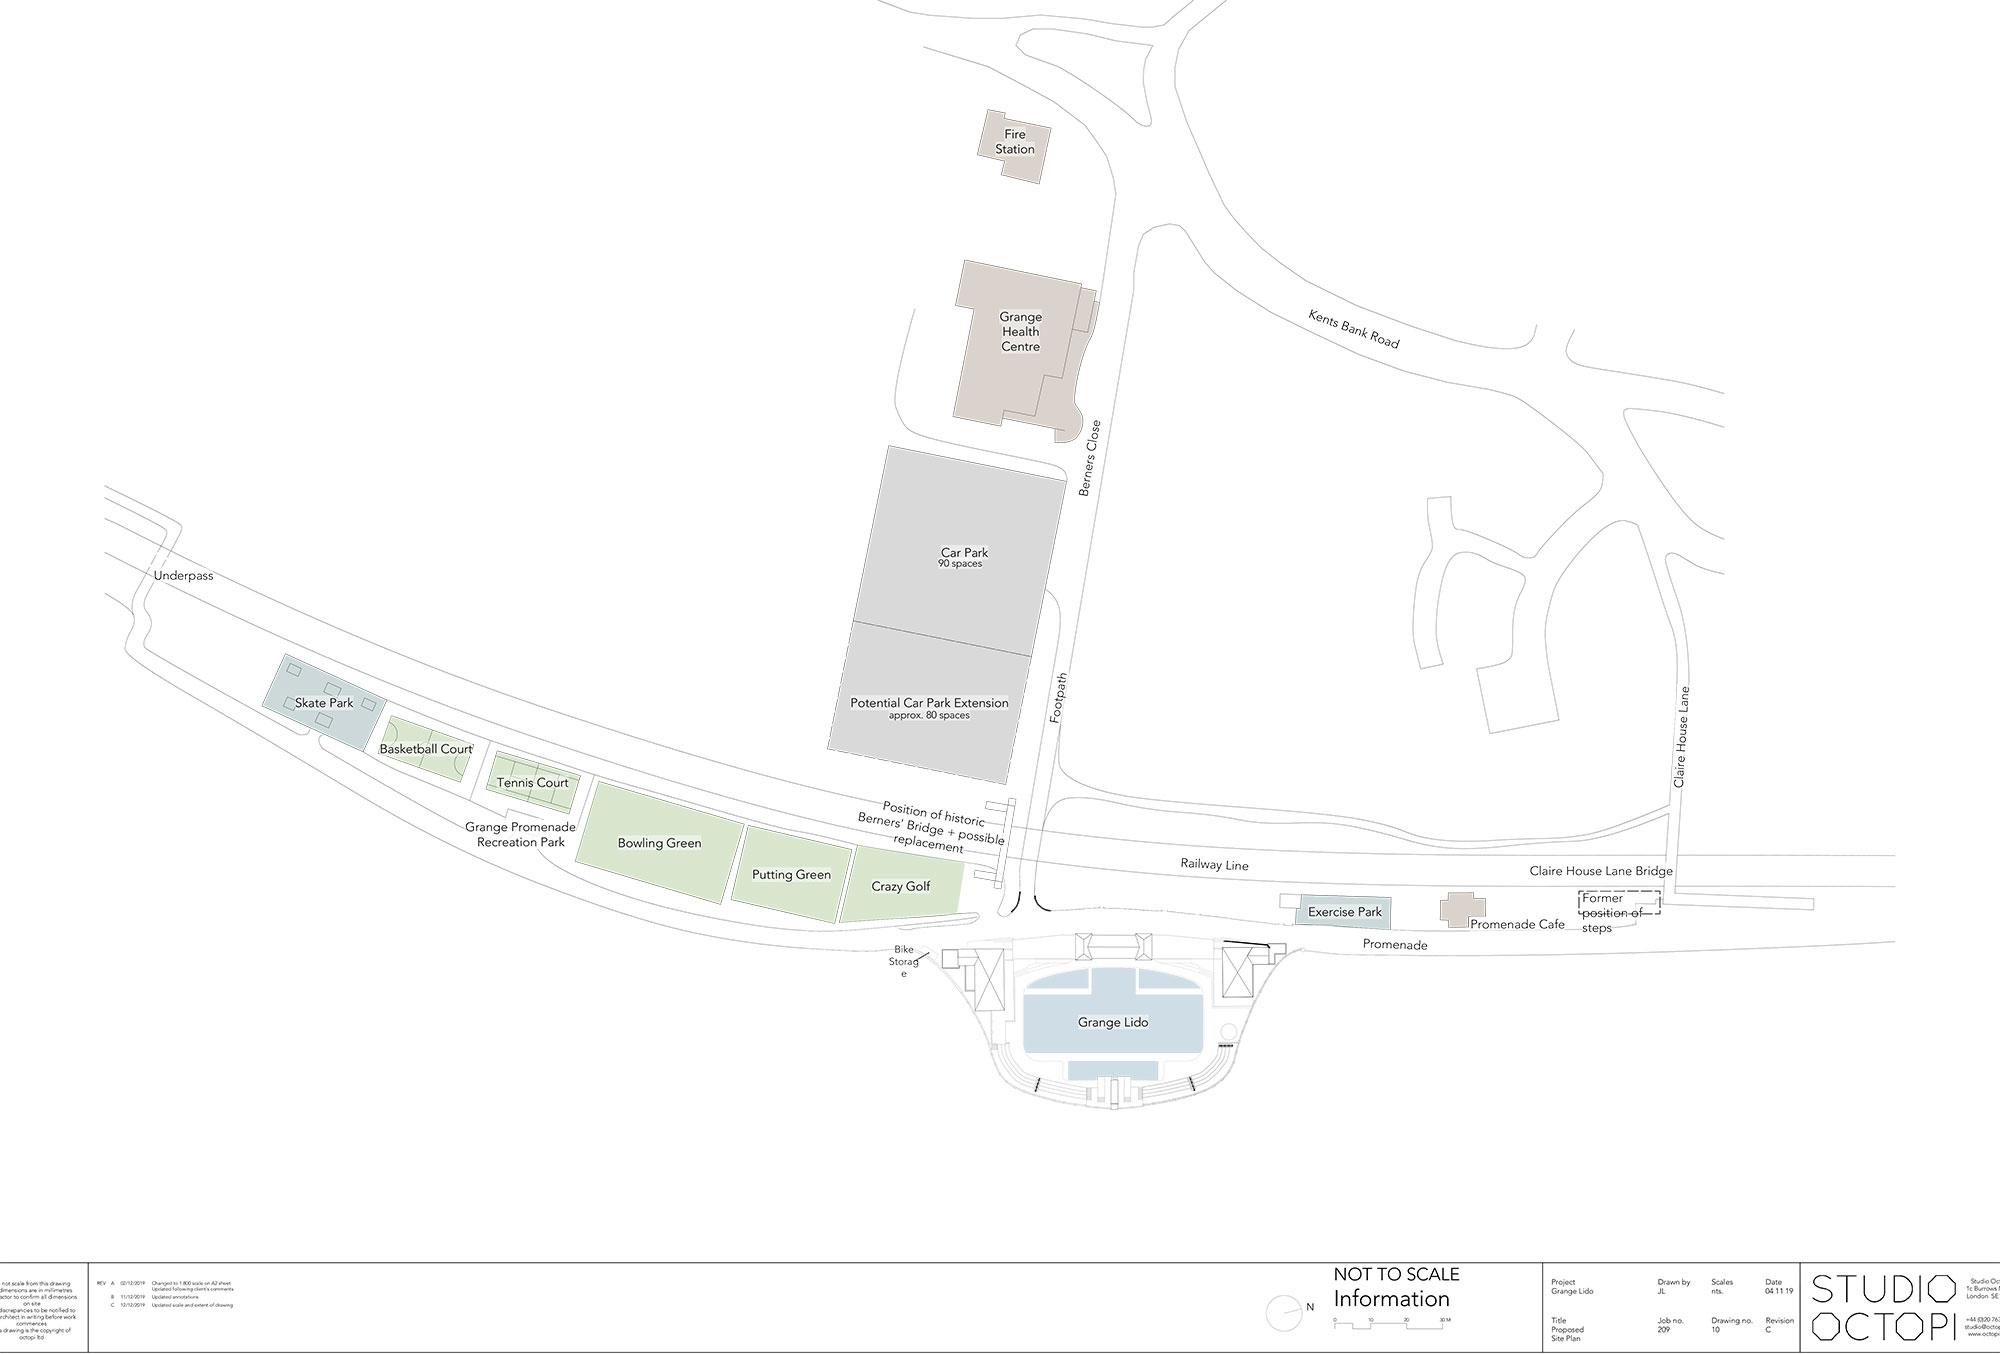 Grange Lido - RIBA Stage 2 plans